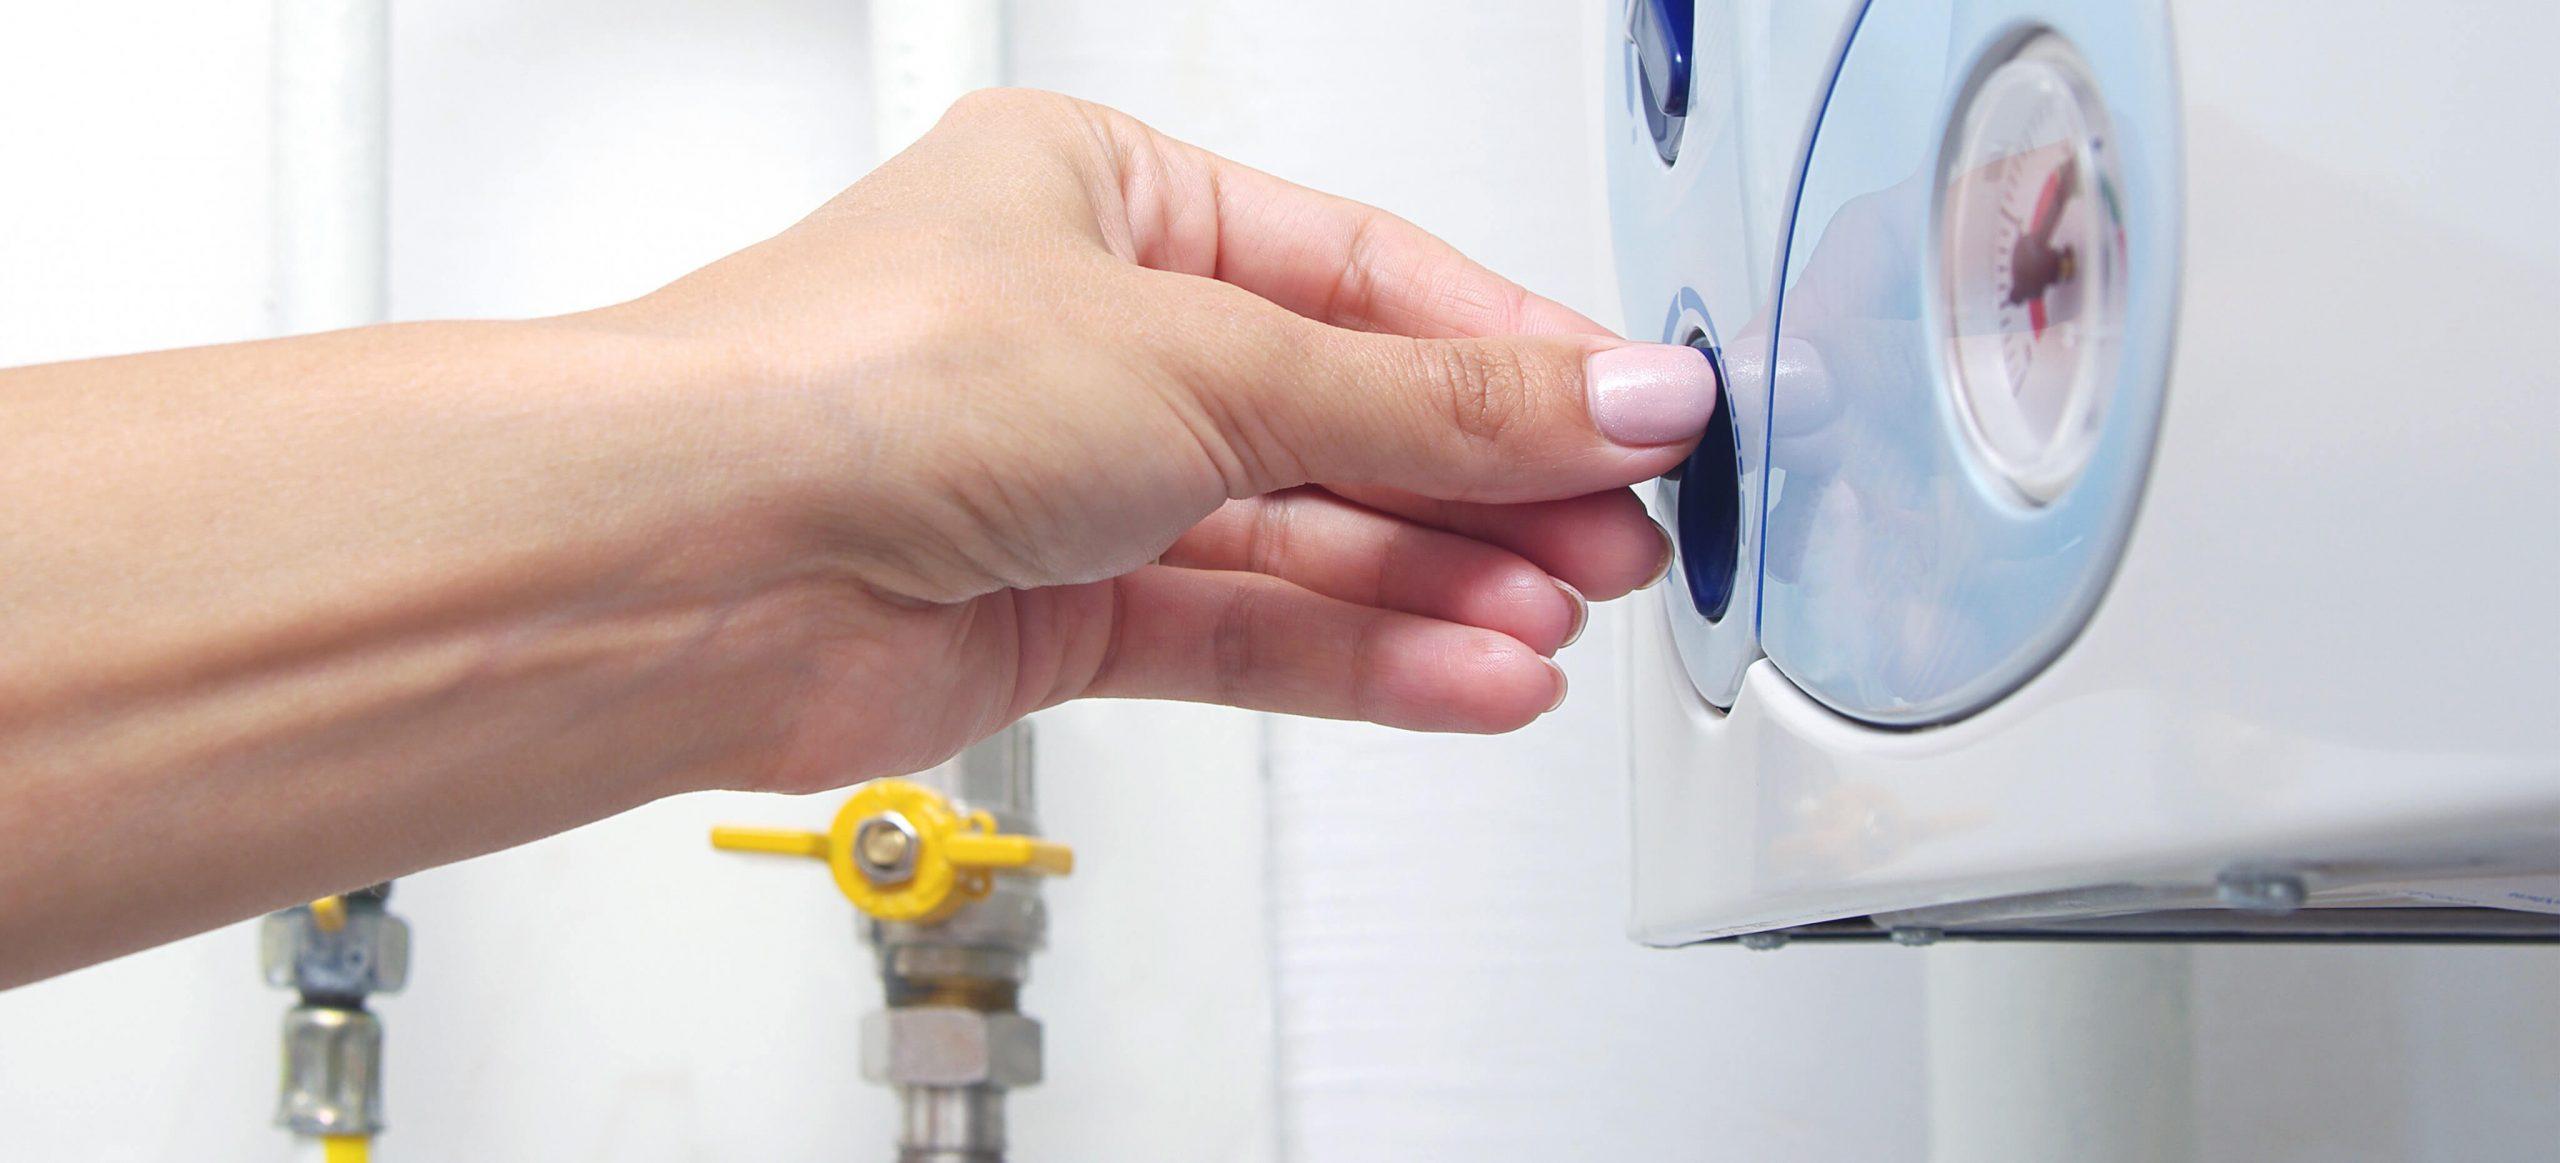 A woman tries to start a boiler that's not firing up